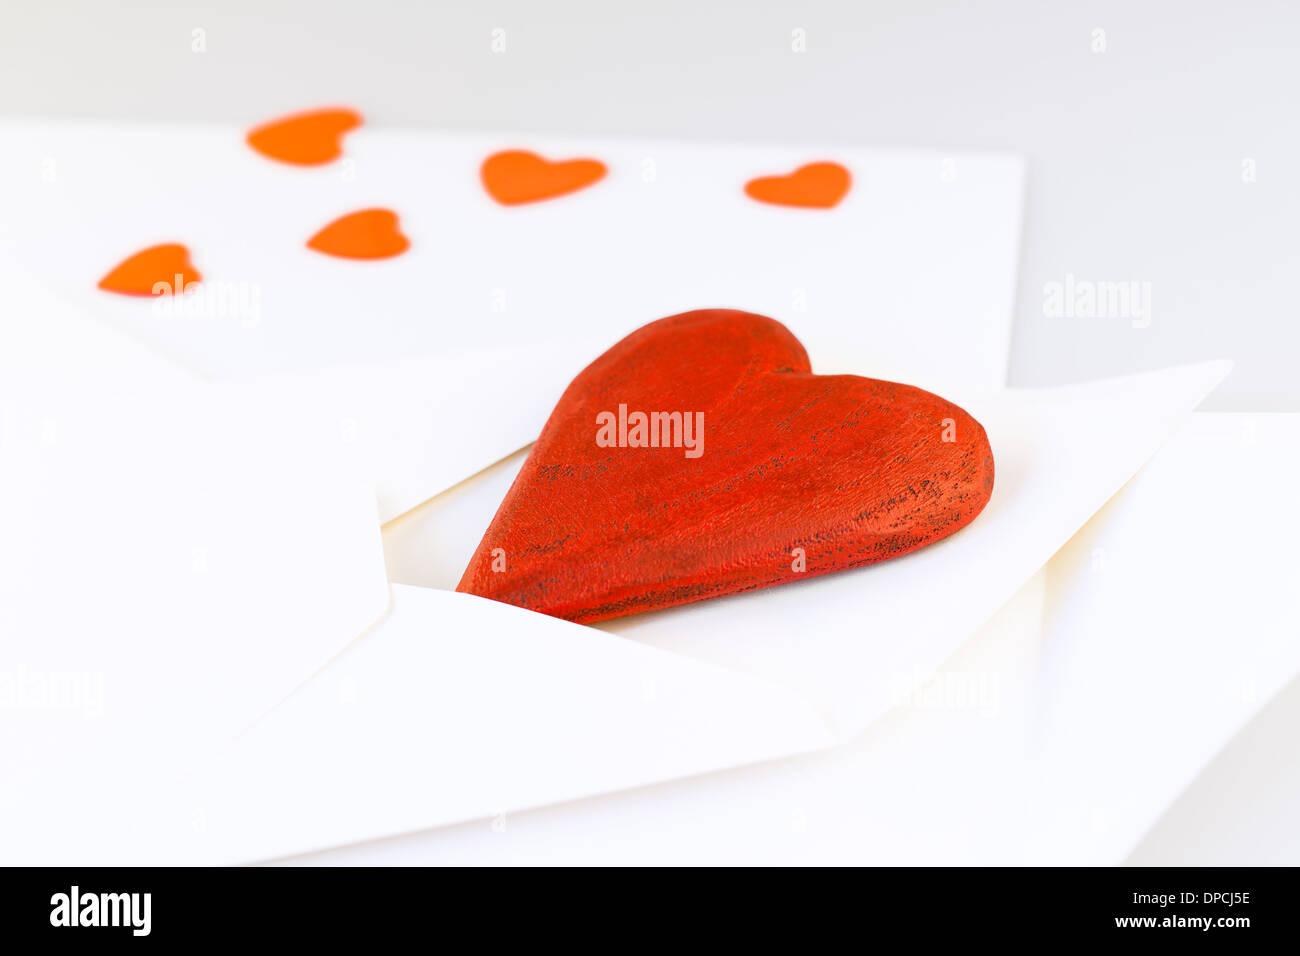 Corazón De Madera Roja En El Sobre Carta De Amor Foto Imagen De